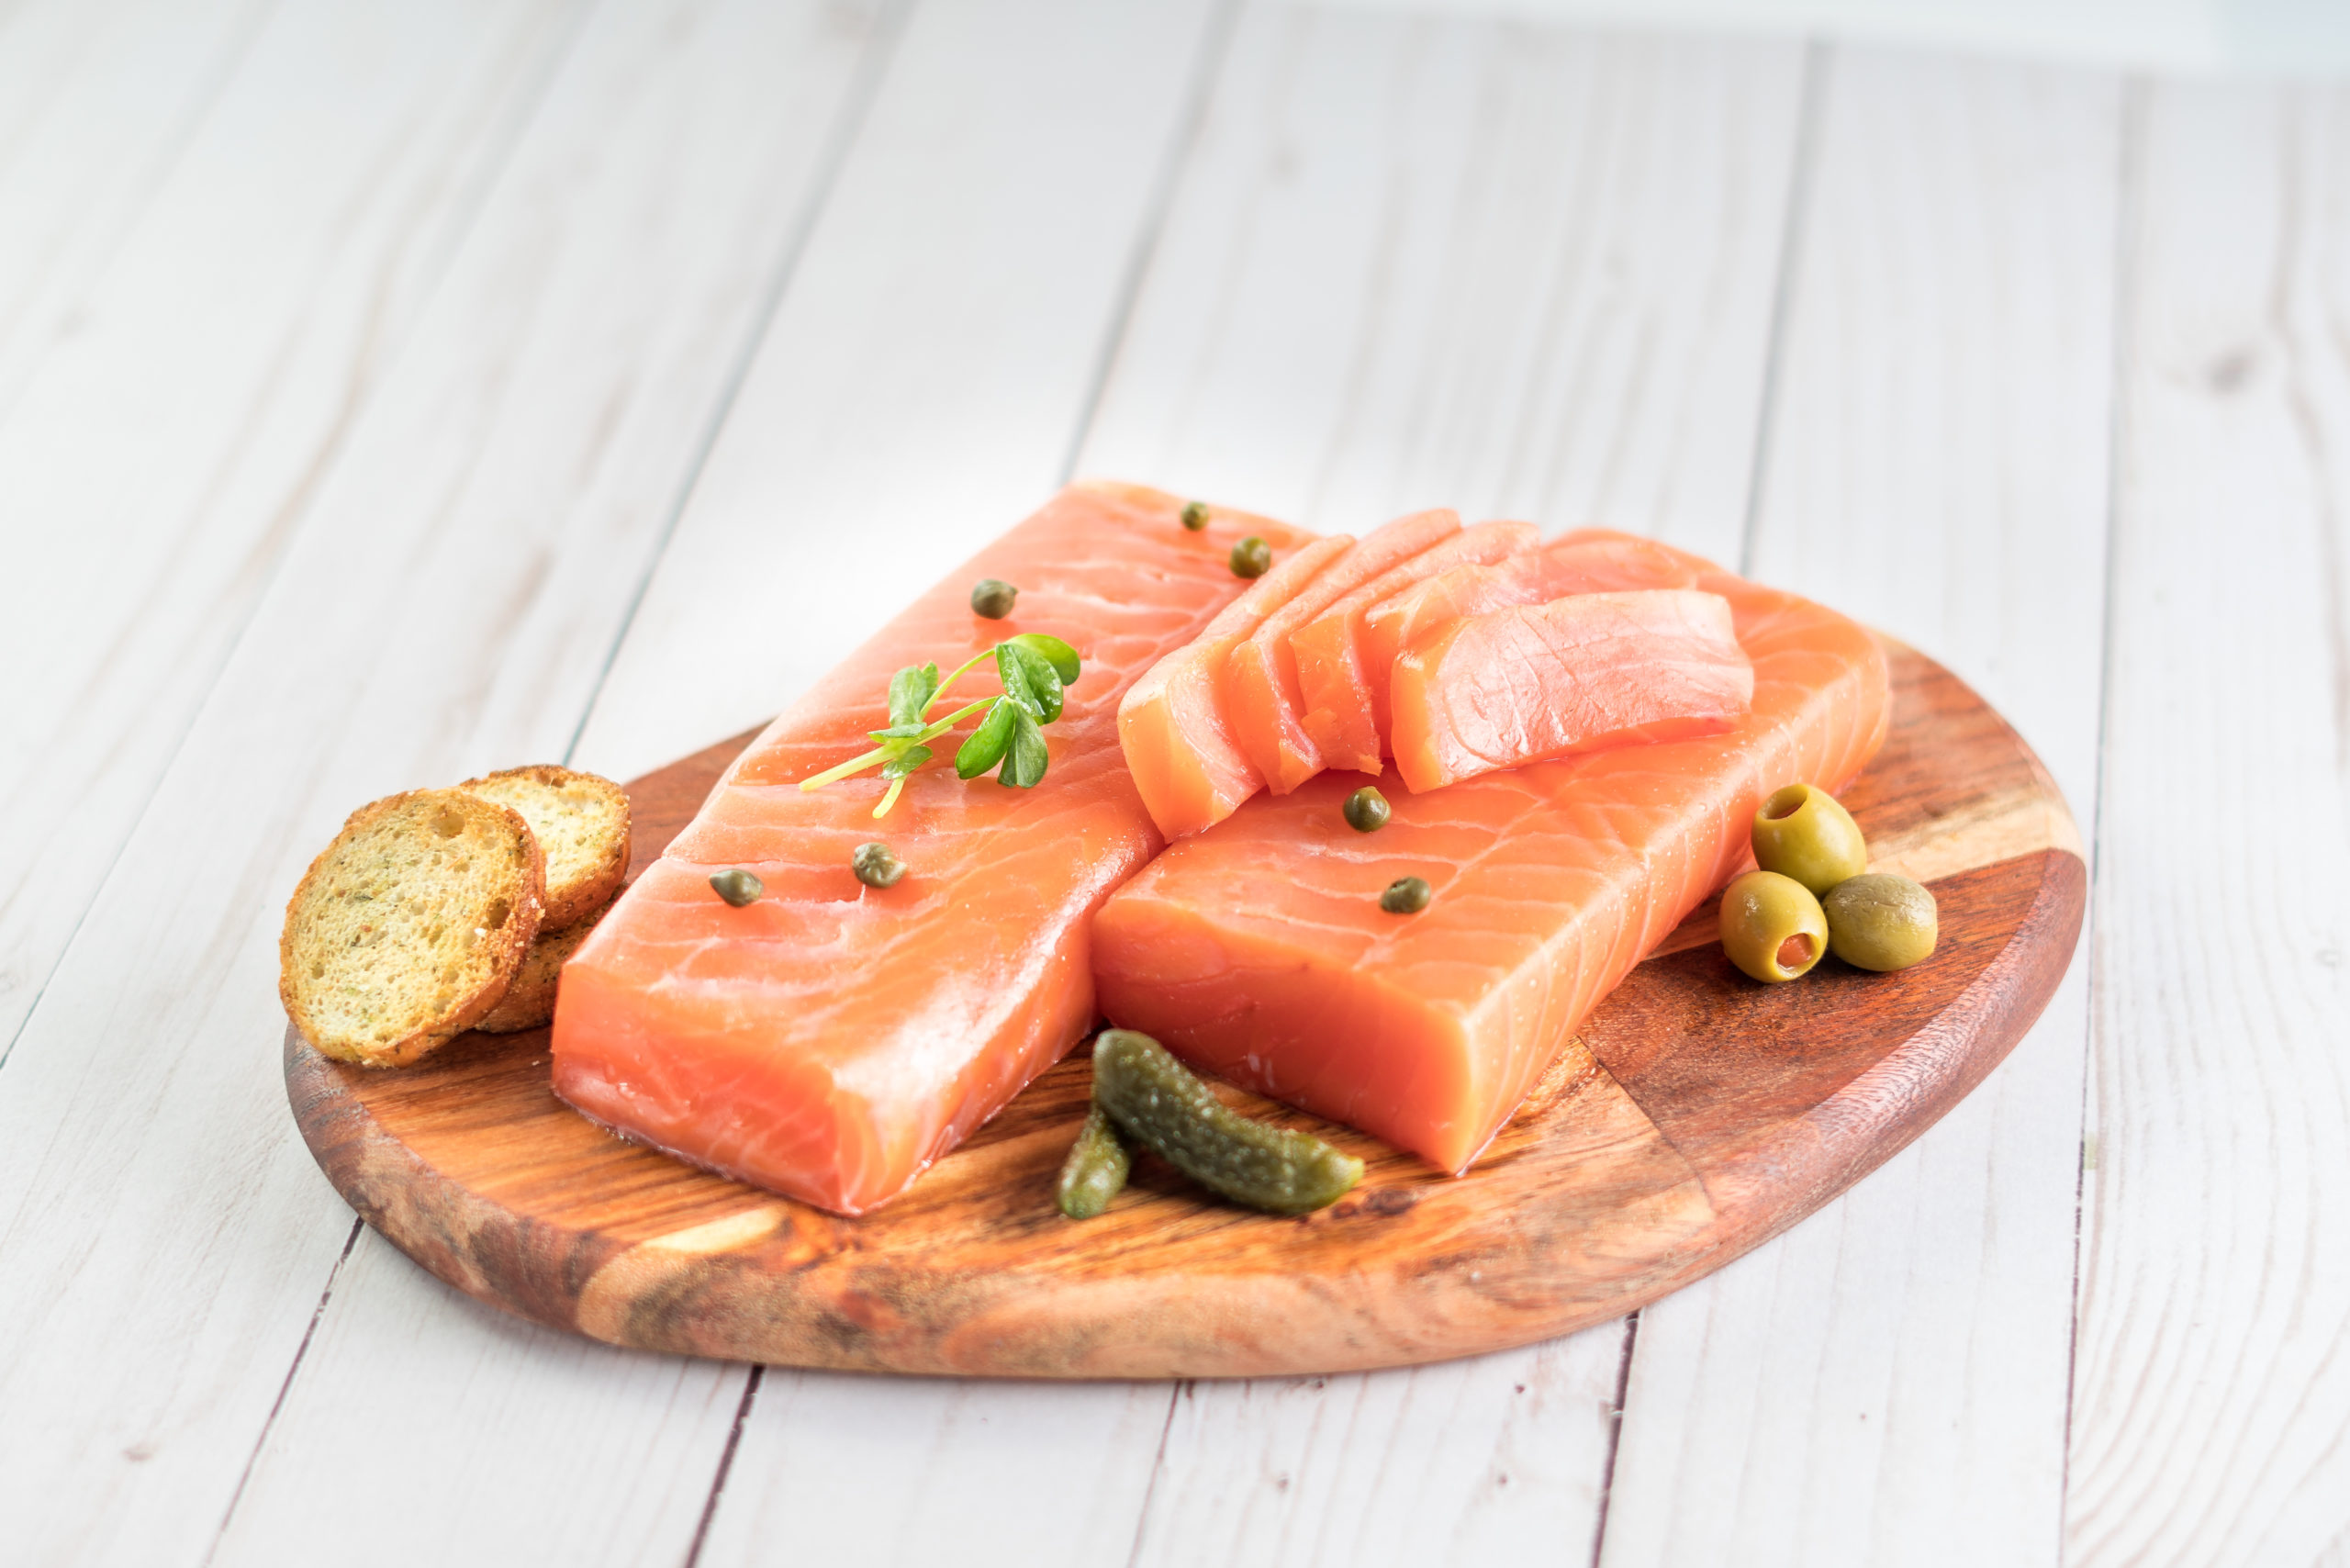 Smoked Atlantic Salmon 'Balik' Style